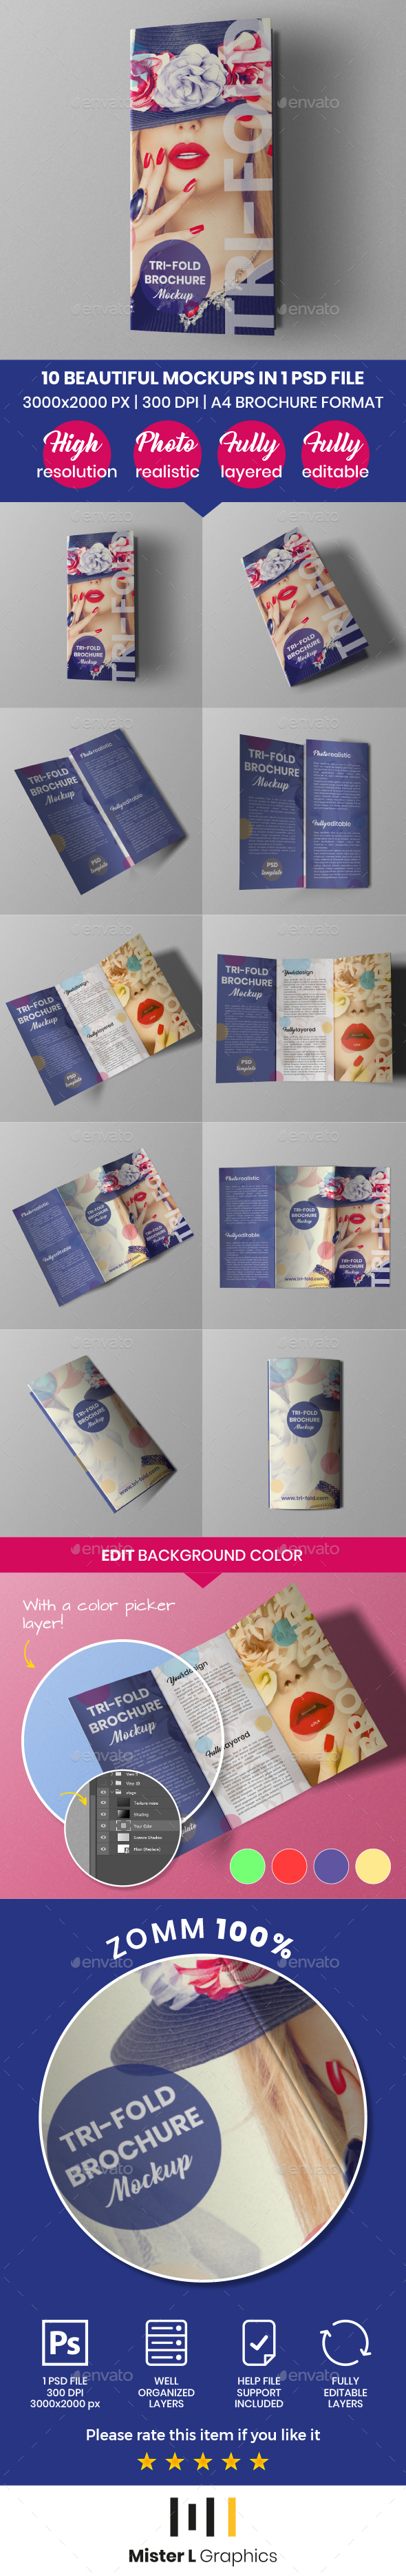 GraphicRiver A4 Trifold Brochure Mockup 21103403